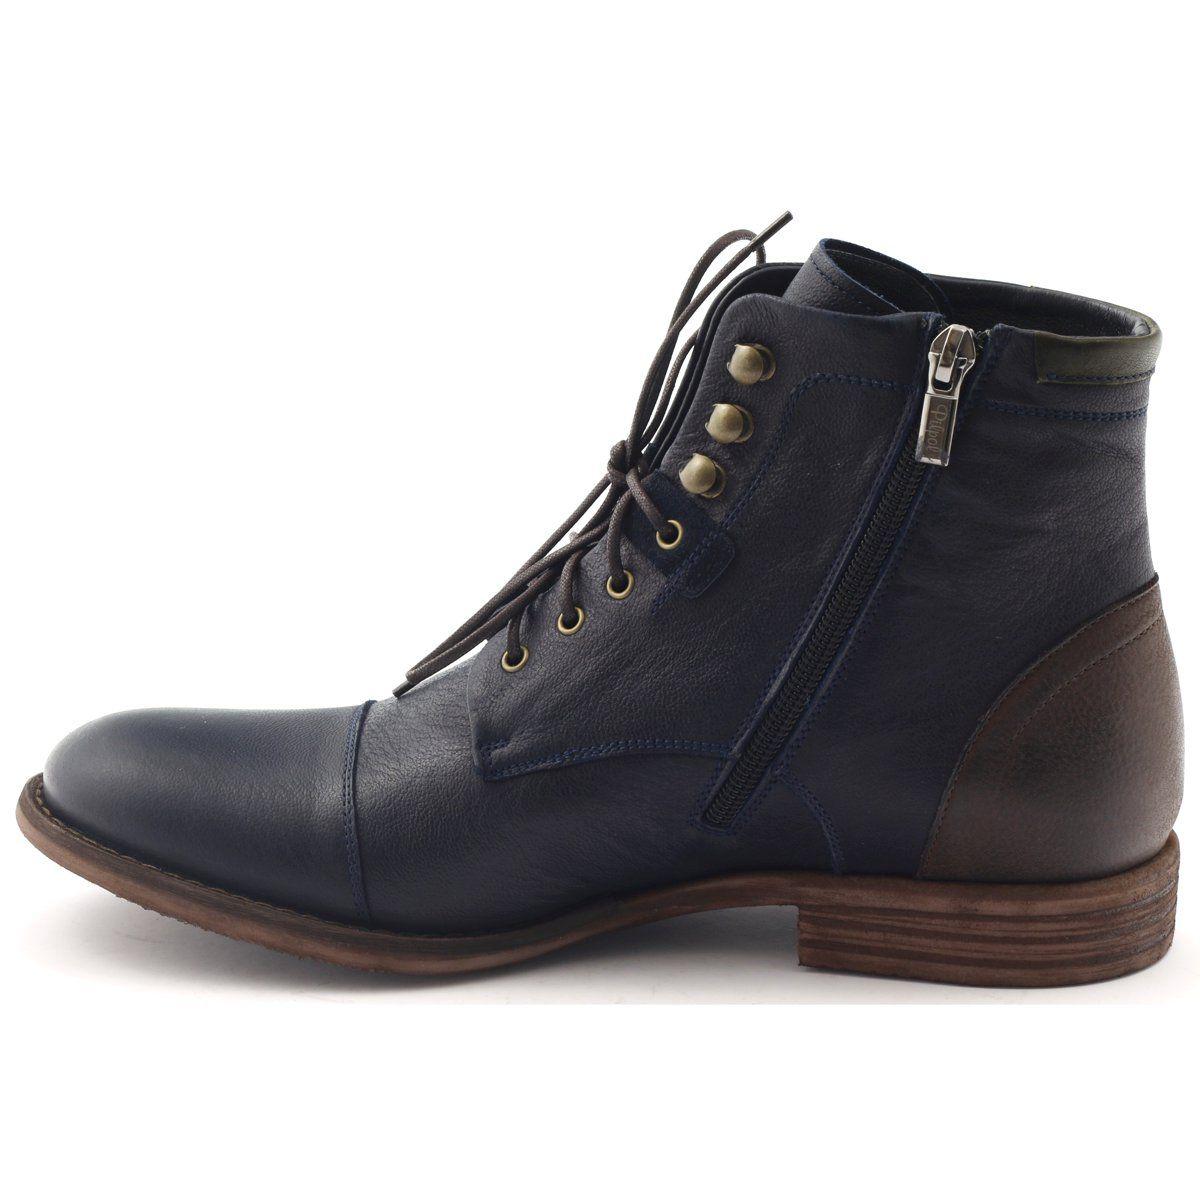 Botki Meskie Zimowe Pilpol C831 Granatowe Brazowe Shoes Boots Combat Boots